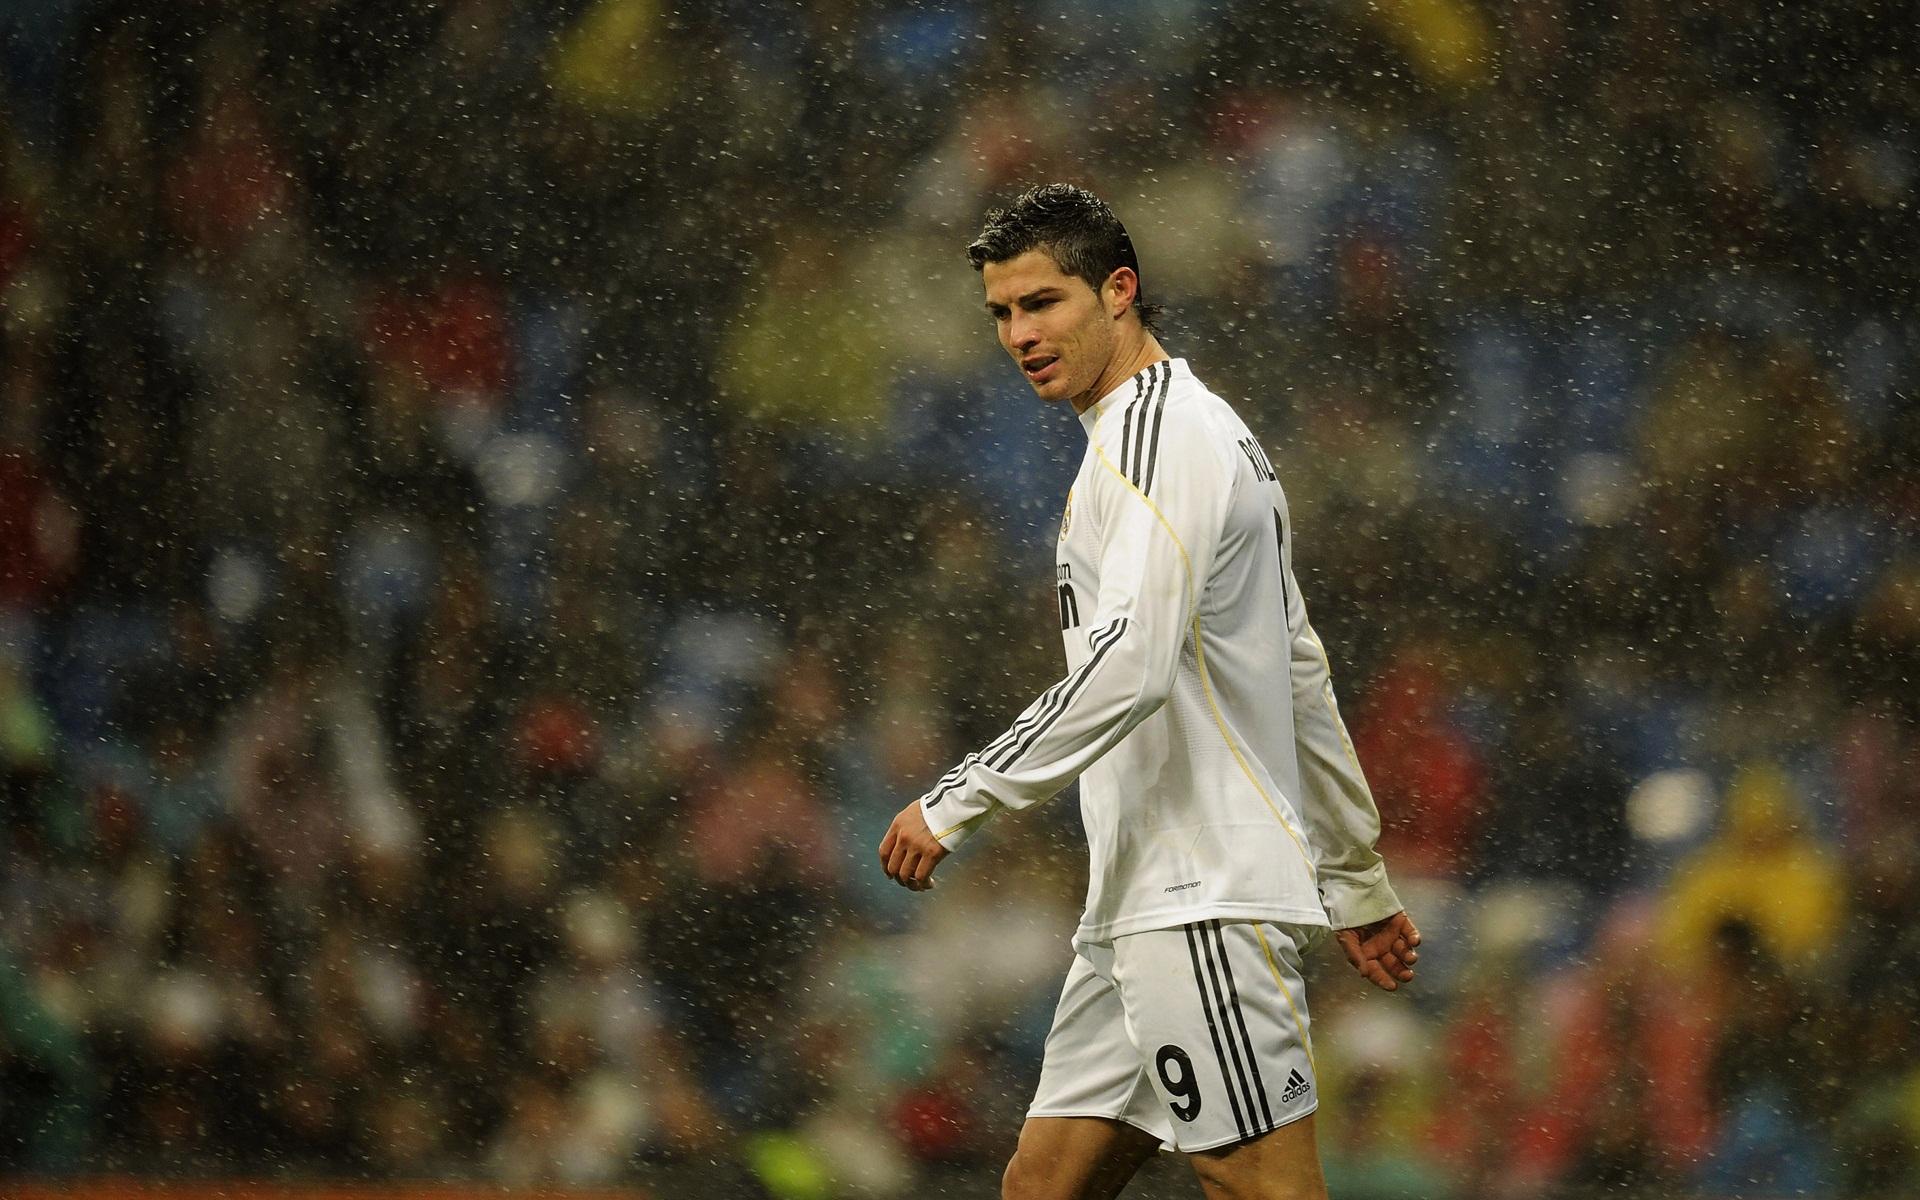 Hd wallpaper ronaldo - Cristiano Ronaldo Real Madrid Wallpapers Hd Wallpapers